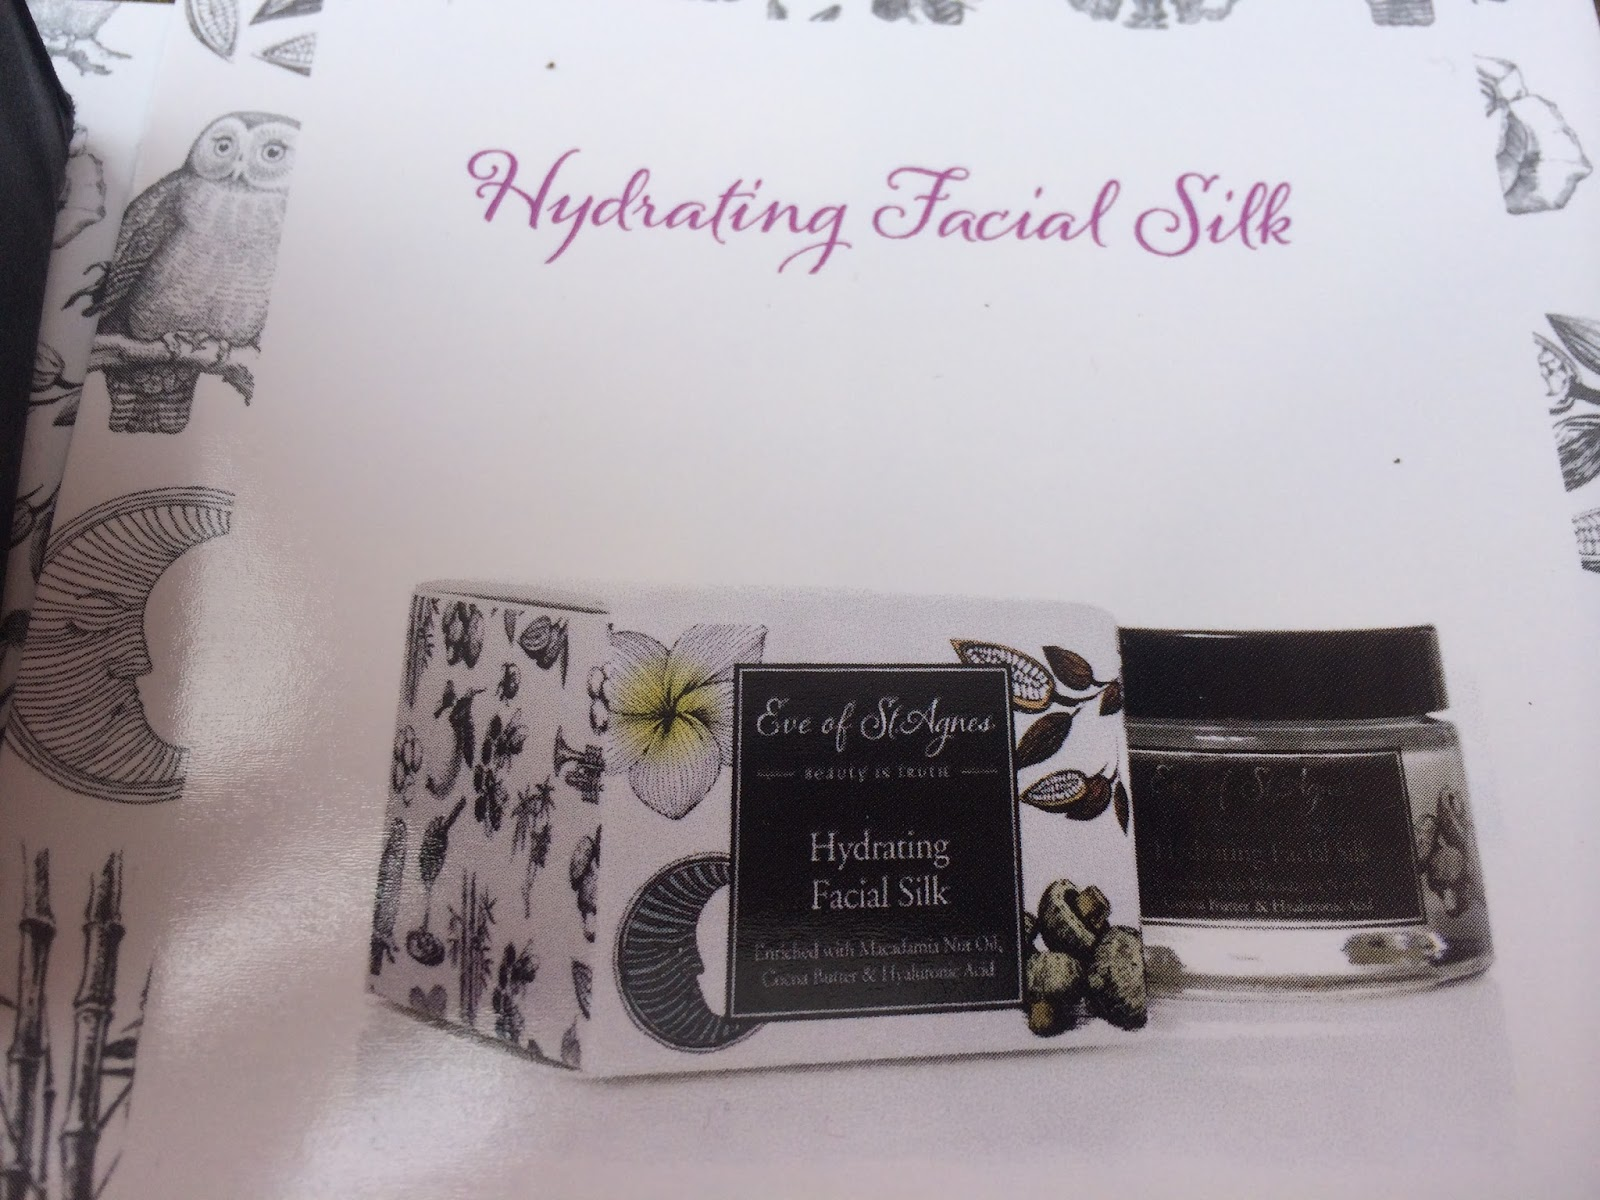 Eve of St Agnes - Hydrating Facial Silk